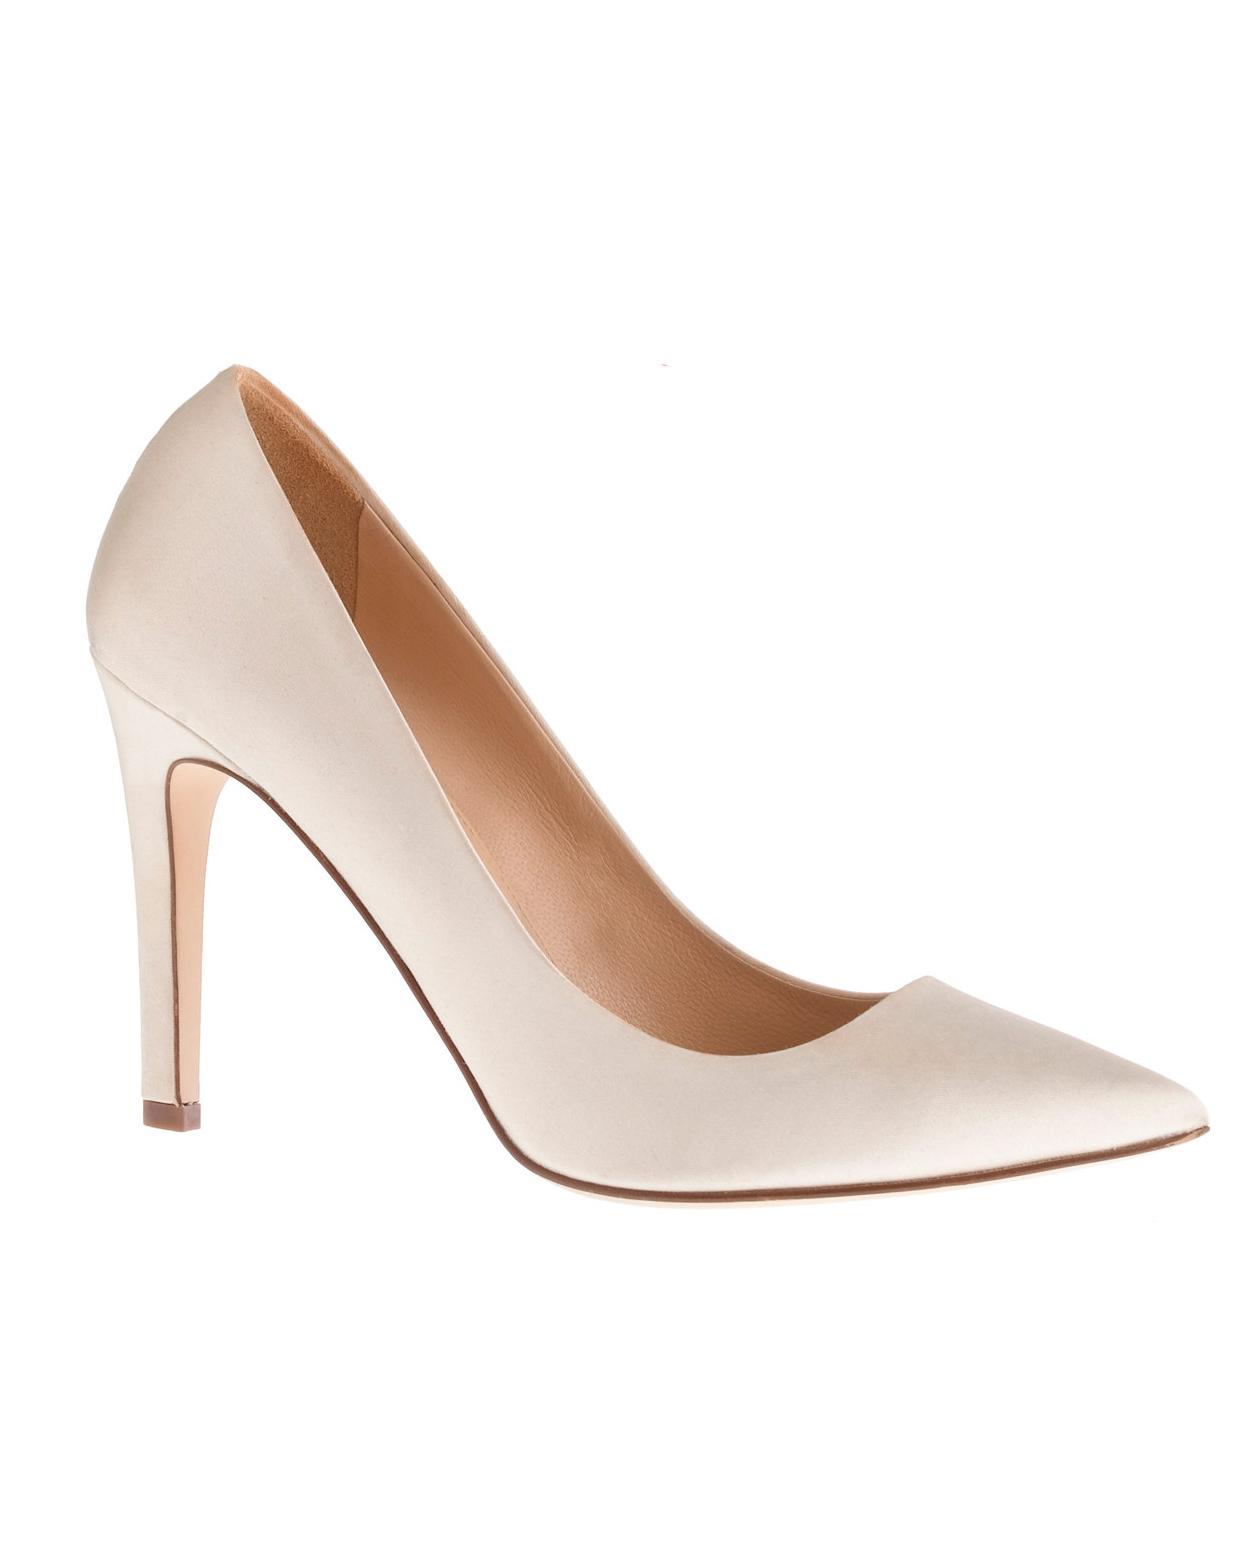 fall-wedding-shoes-jcrew-everly-0914.jpg